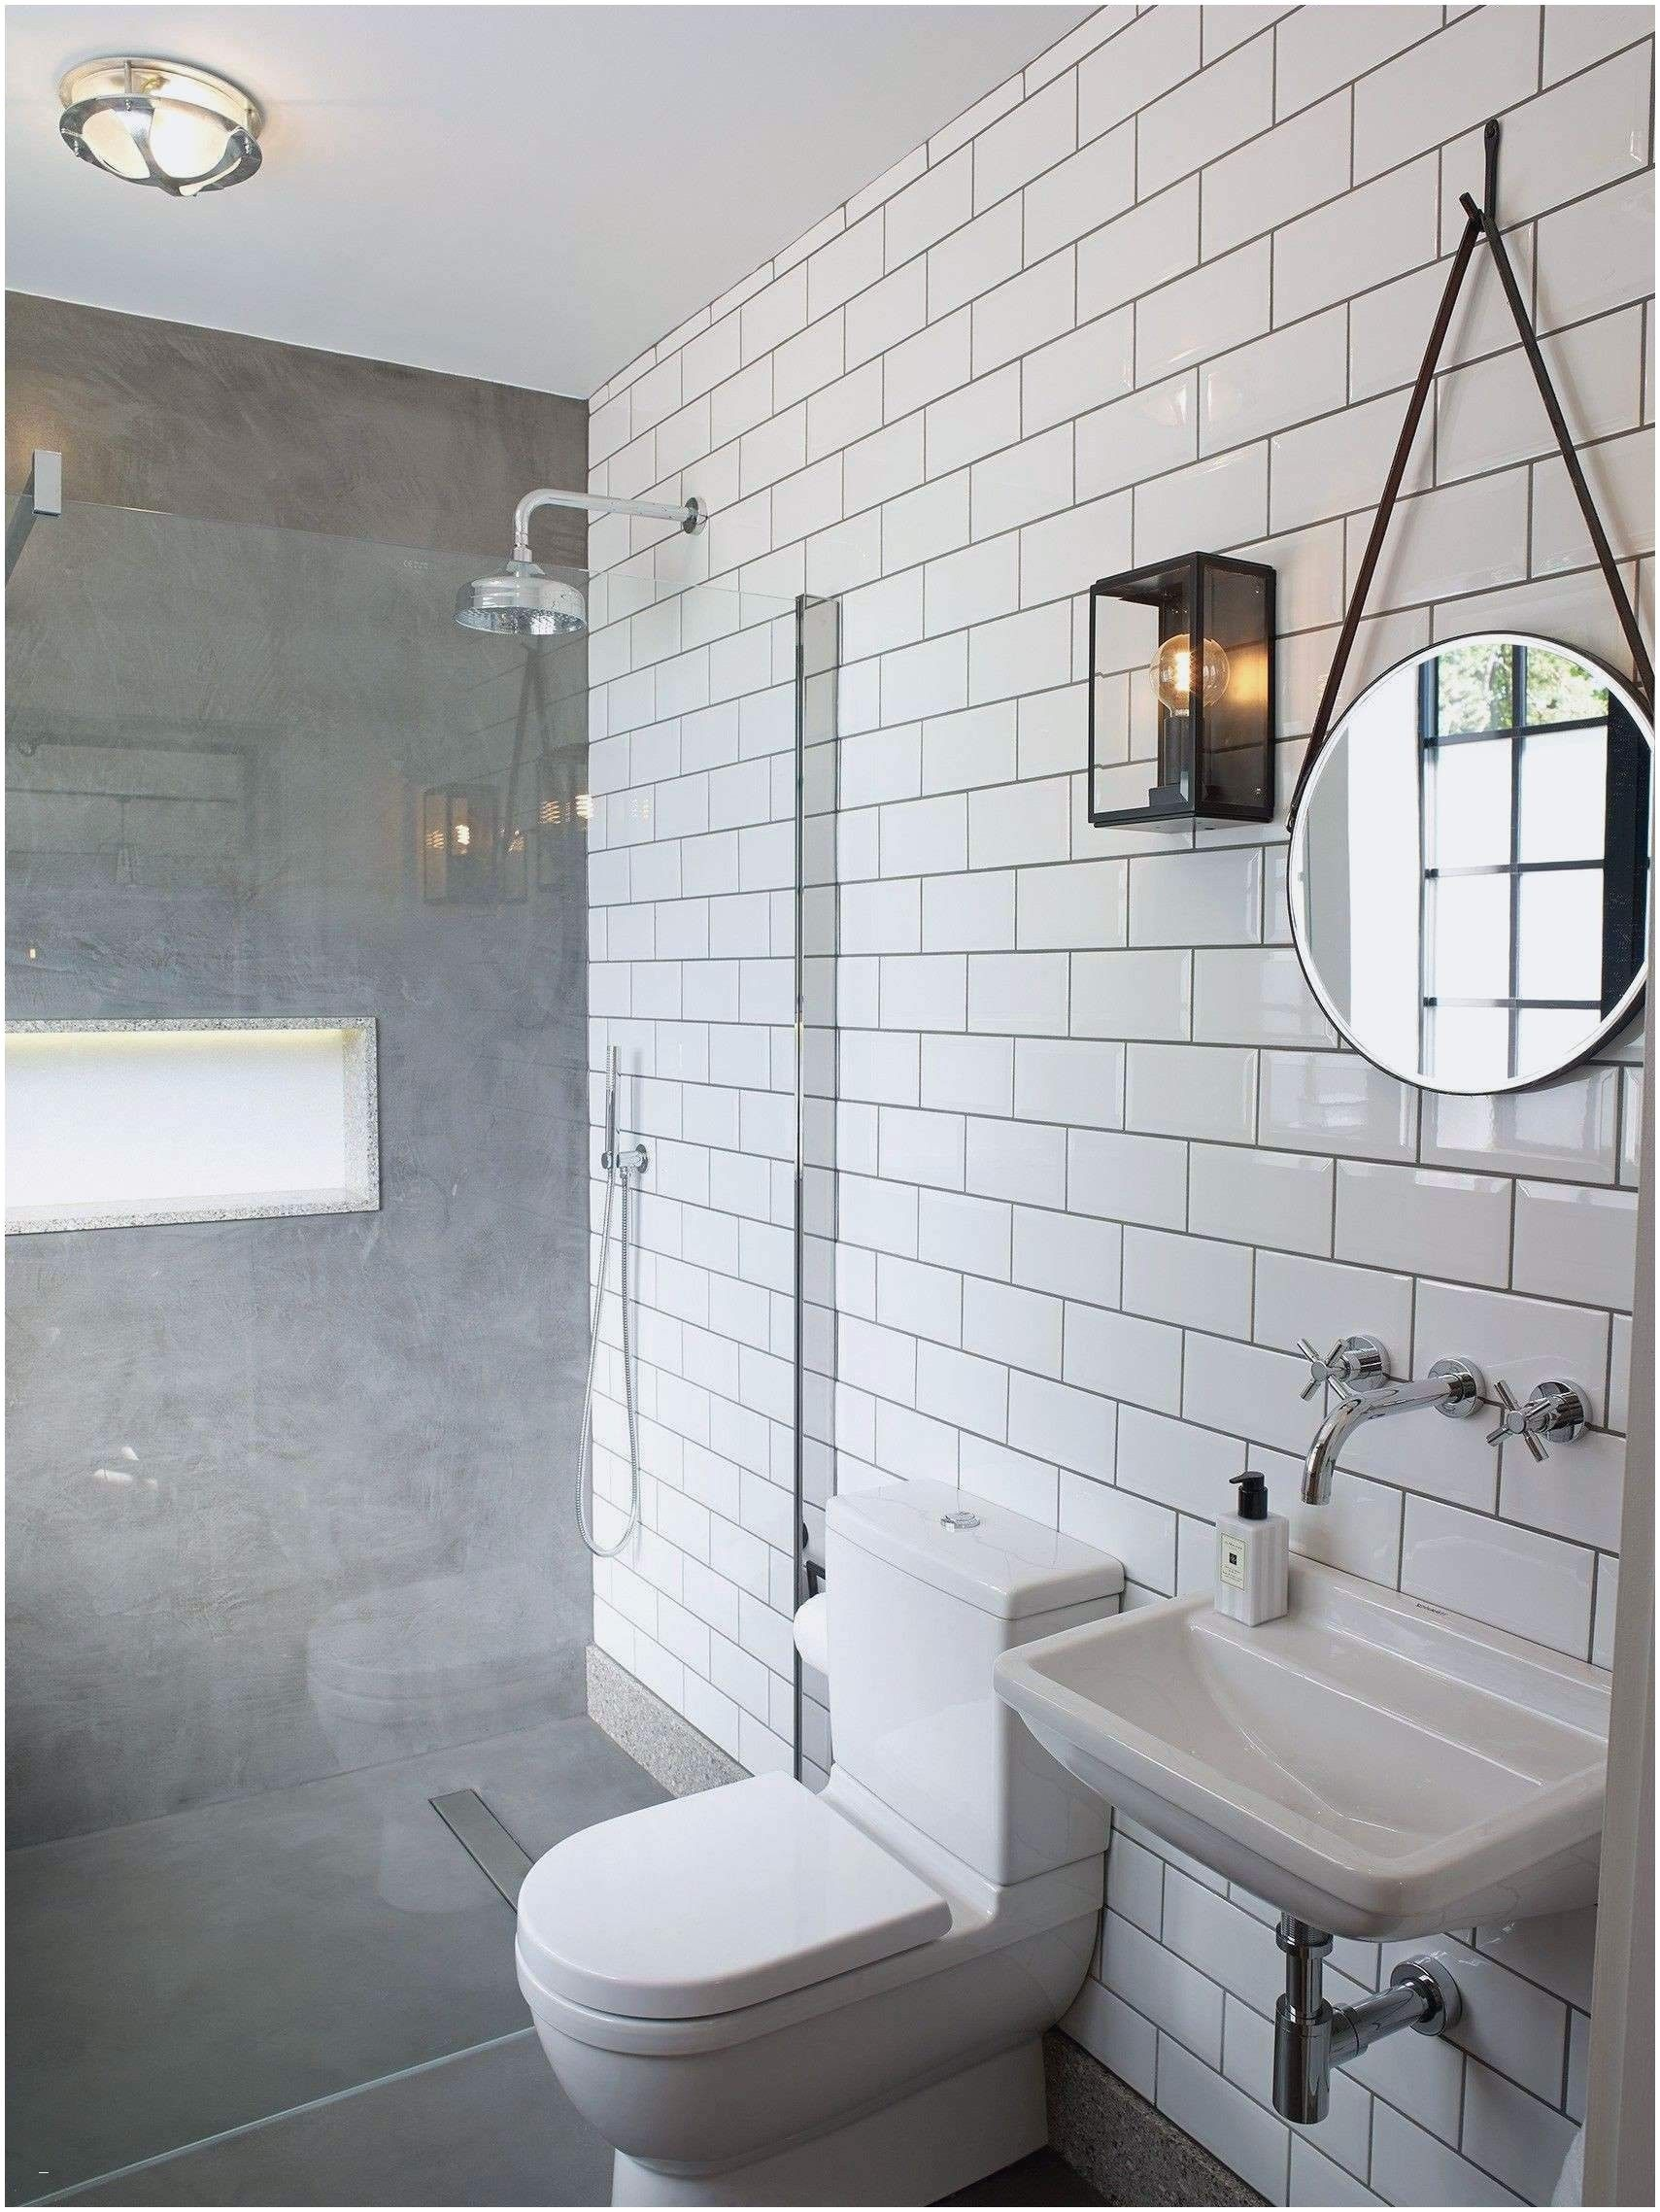 9 Awesome Floor Design Ideas In 2020 Bathroom Concrete Floor Concrete Bathroom Bathroom Wall Decor